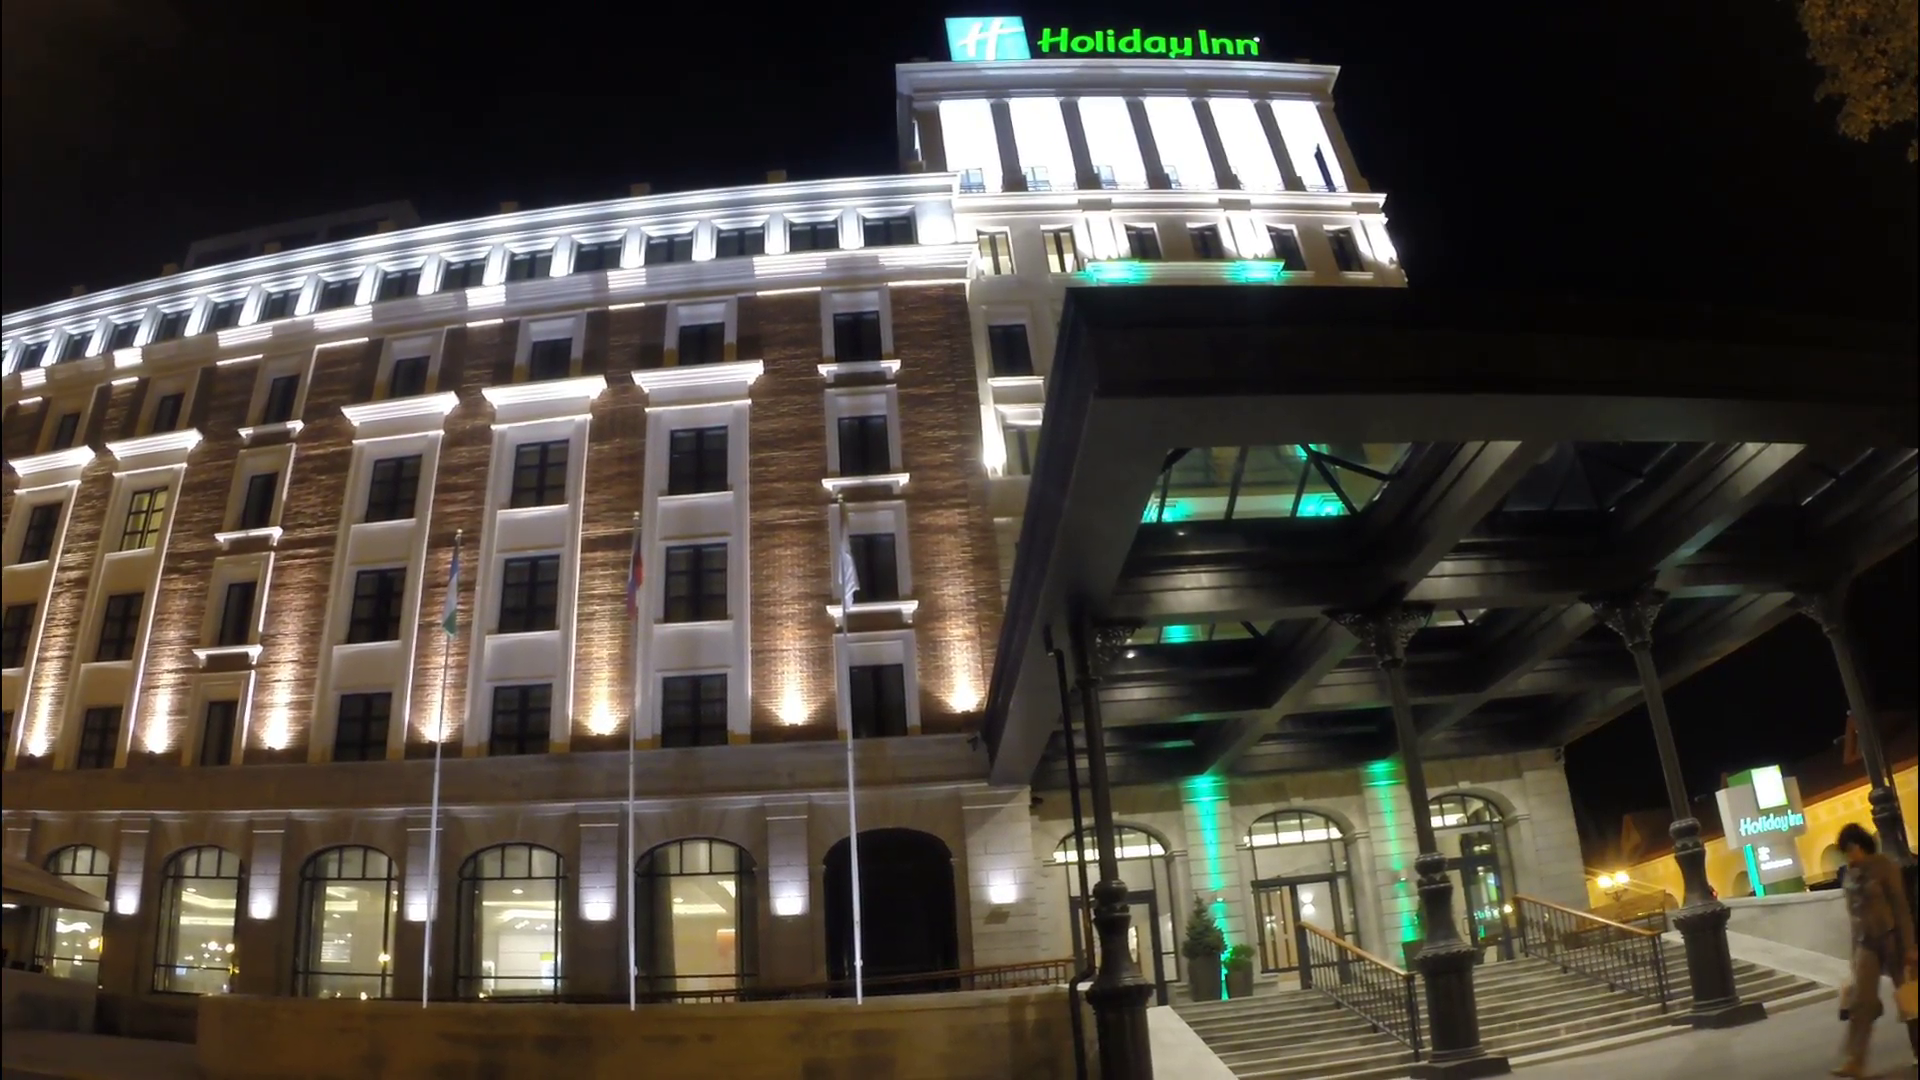 Holiday Inn Hotel in Ufa evening. Stock Video Footage - VideoBlocks